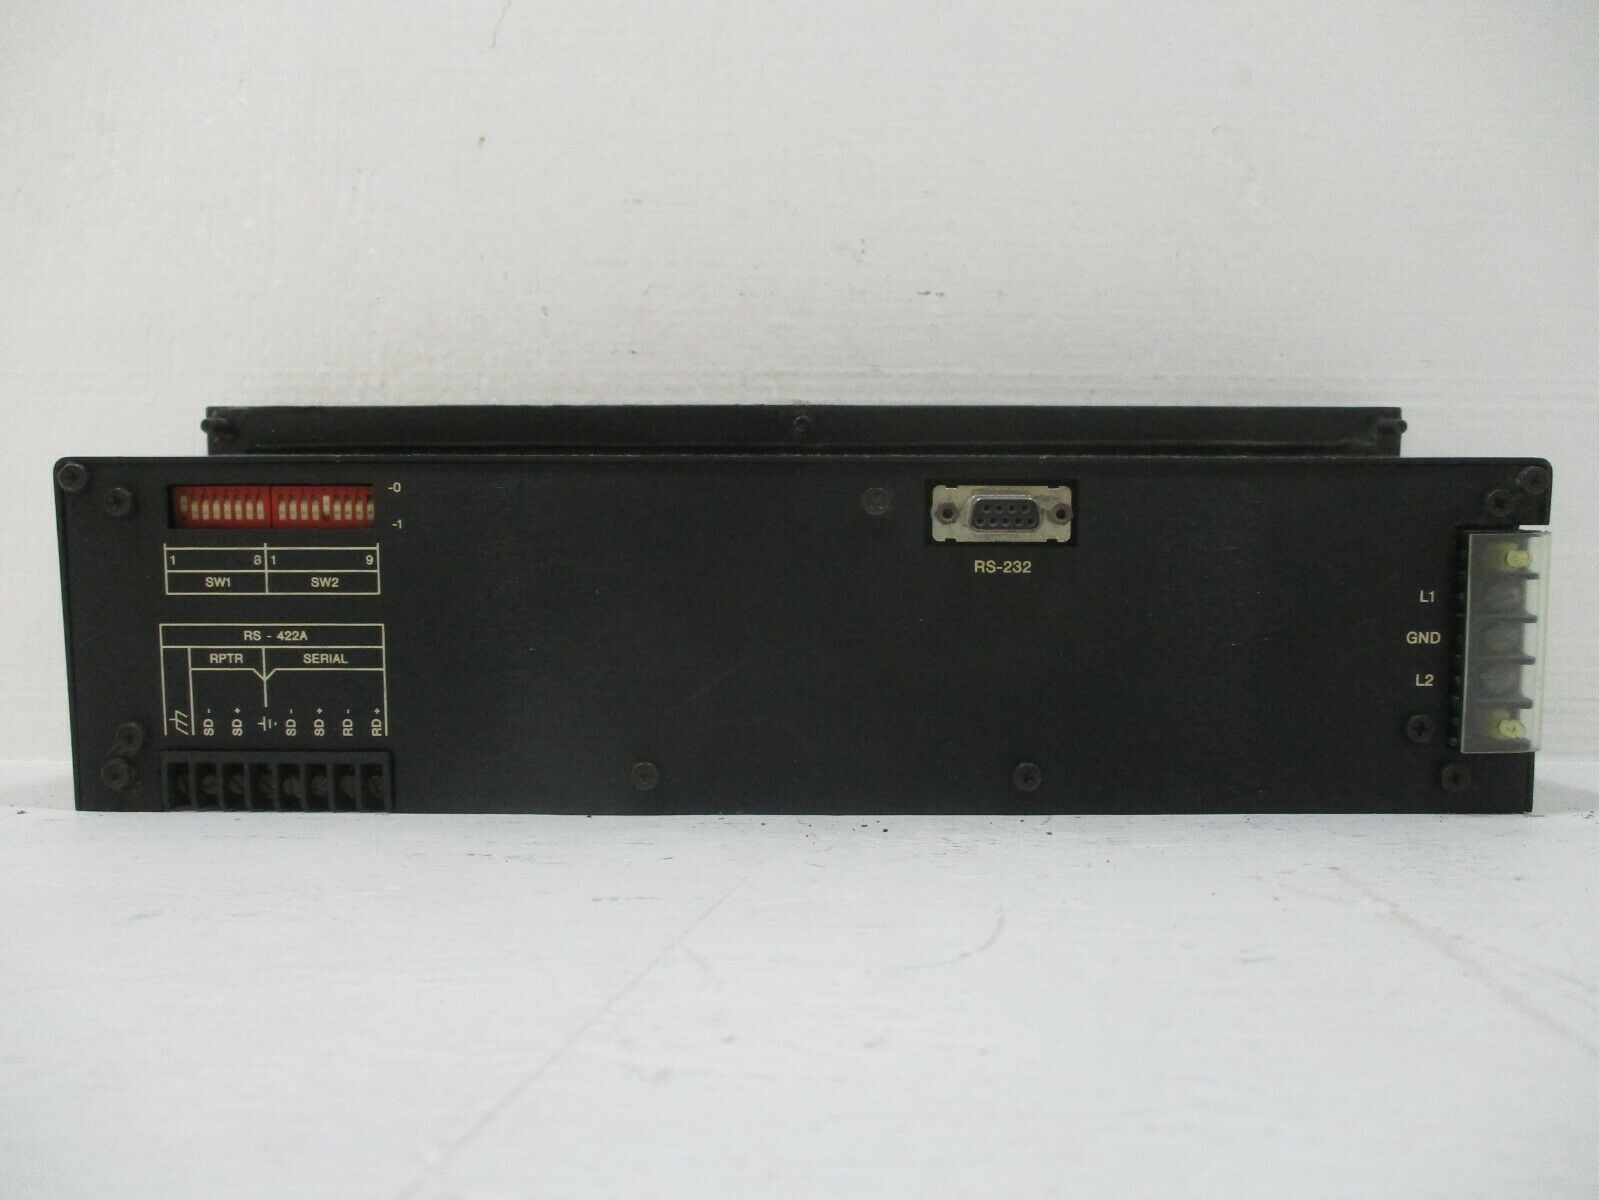 Uticor Technology PMD 150 Programmable Message Display 150-115N2L08EX Rev.B 115V